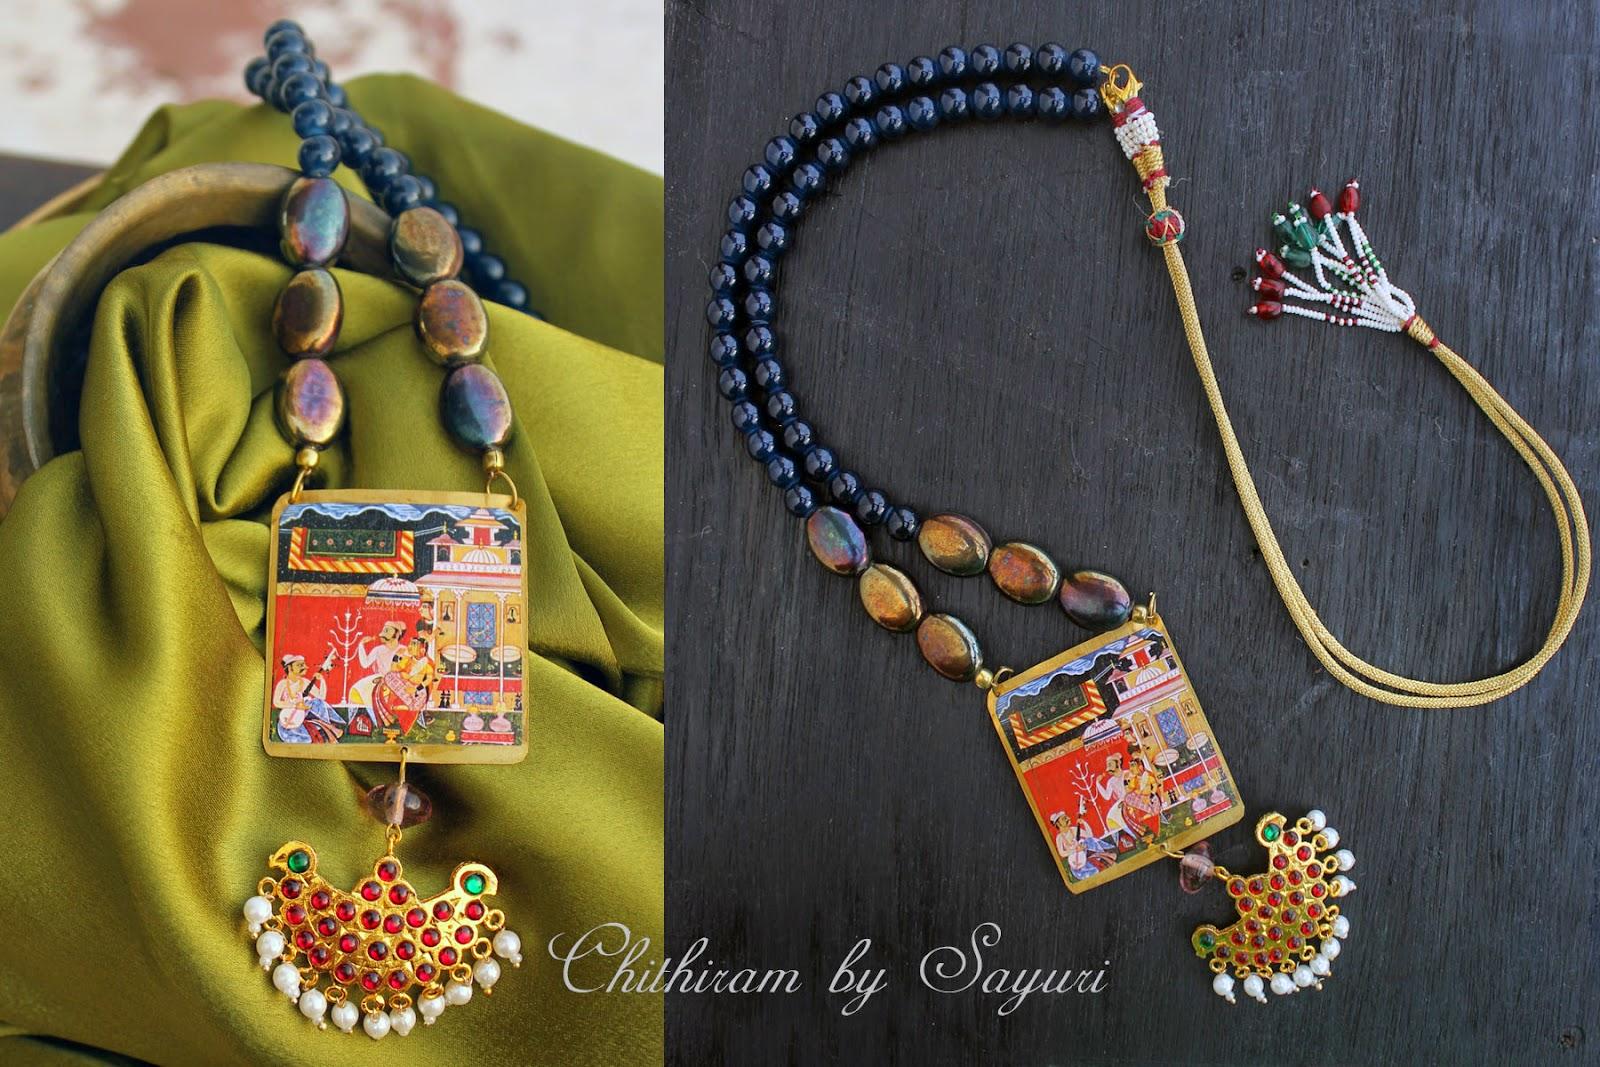 Jewelry inspired by #Hindustani music